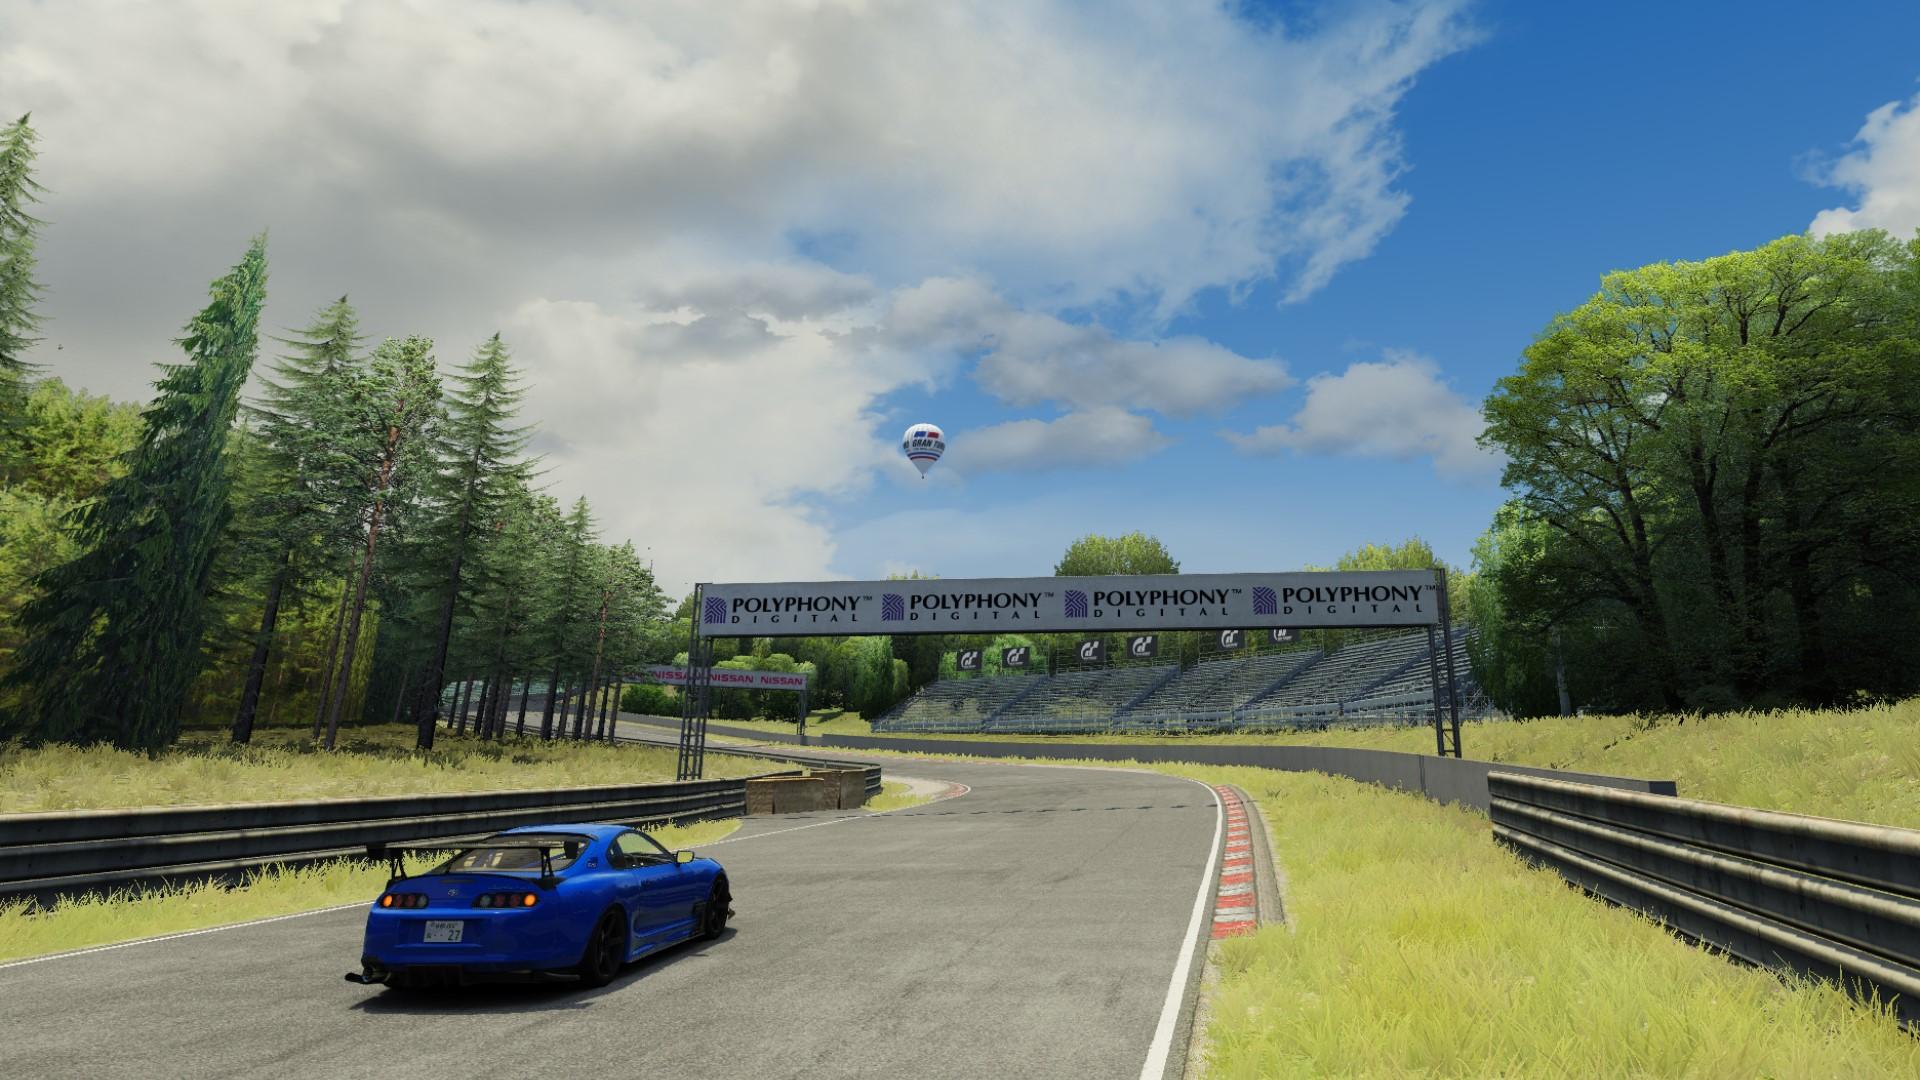 Screenshot_sl_toyota_supra_mkiv_ridox_deepforest_raceway_9-5-120-21-19-2.jpg